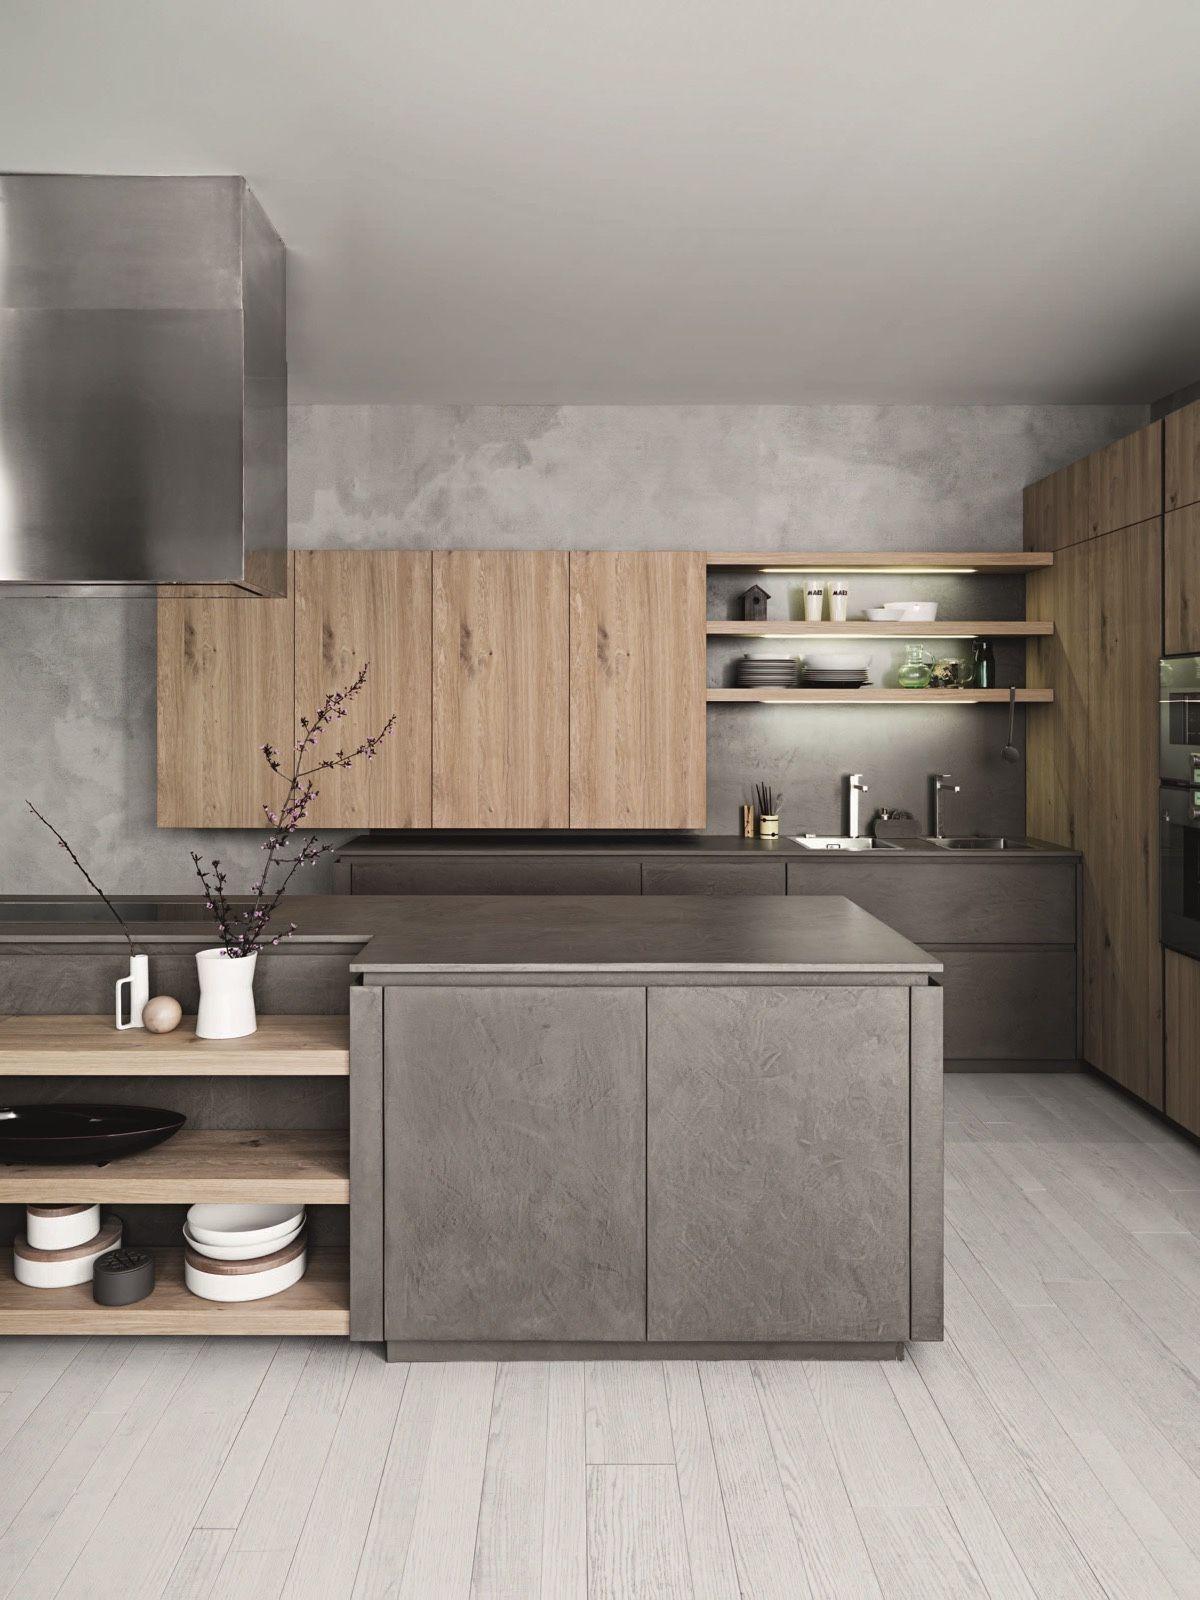 40 Gorgeous Grey Kitchens キッチンインテリアデザイン キッチン